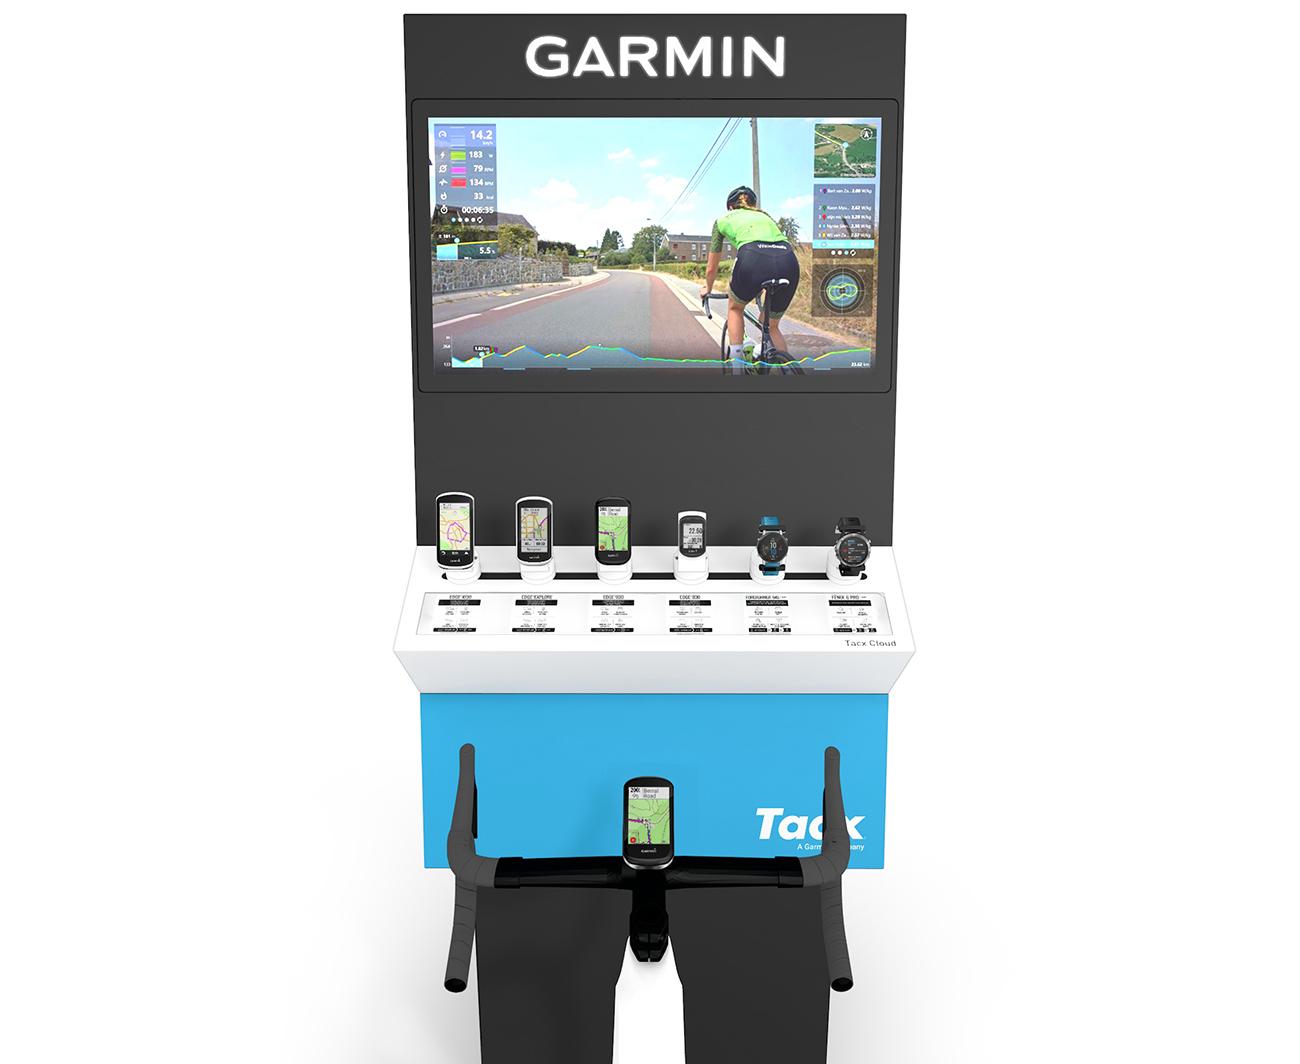 Garmin Global Cycling Display Front 1300